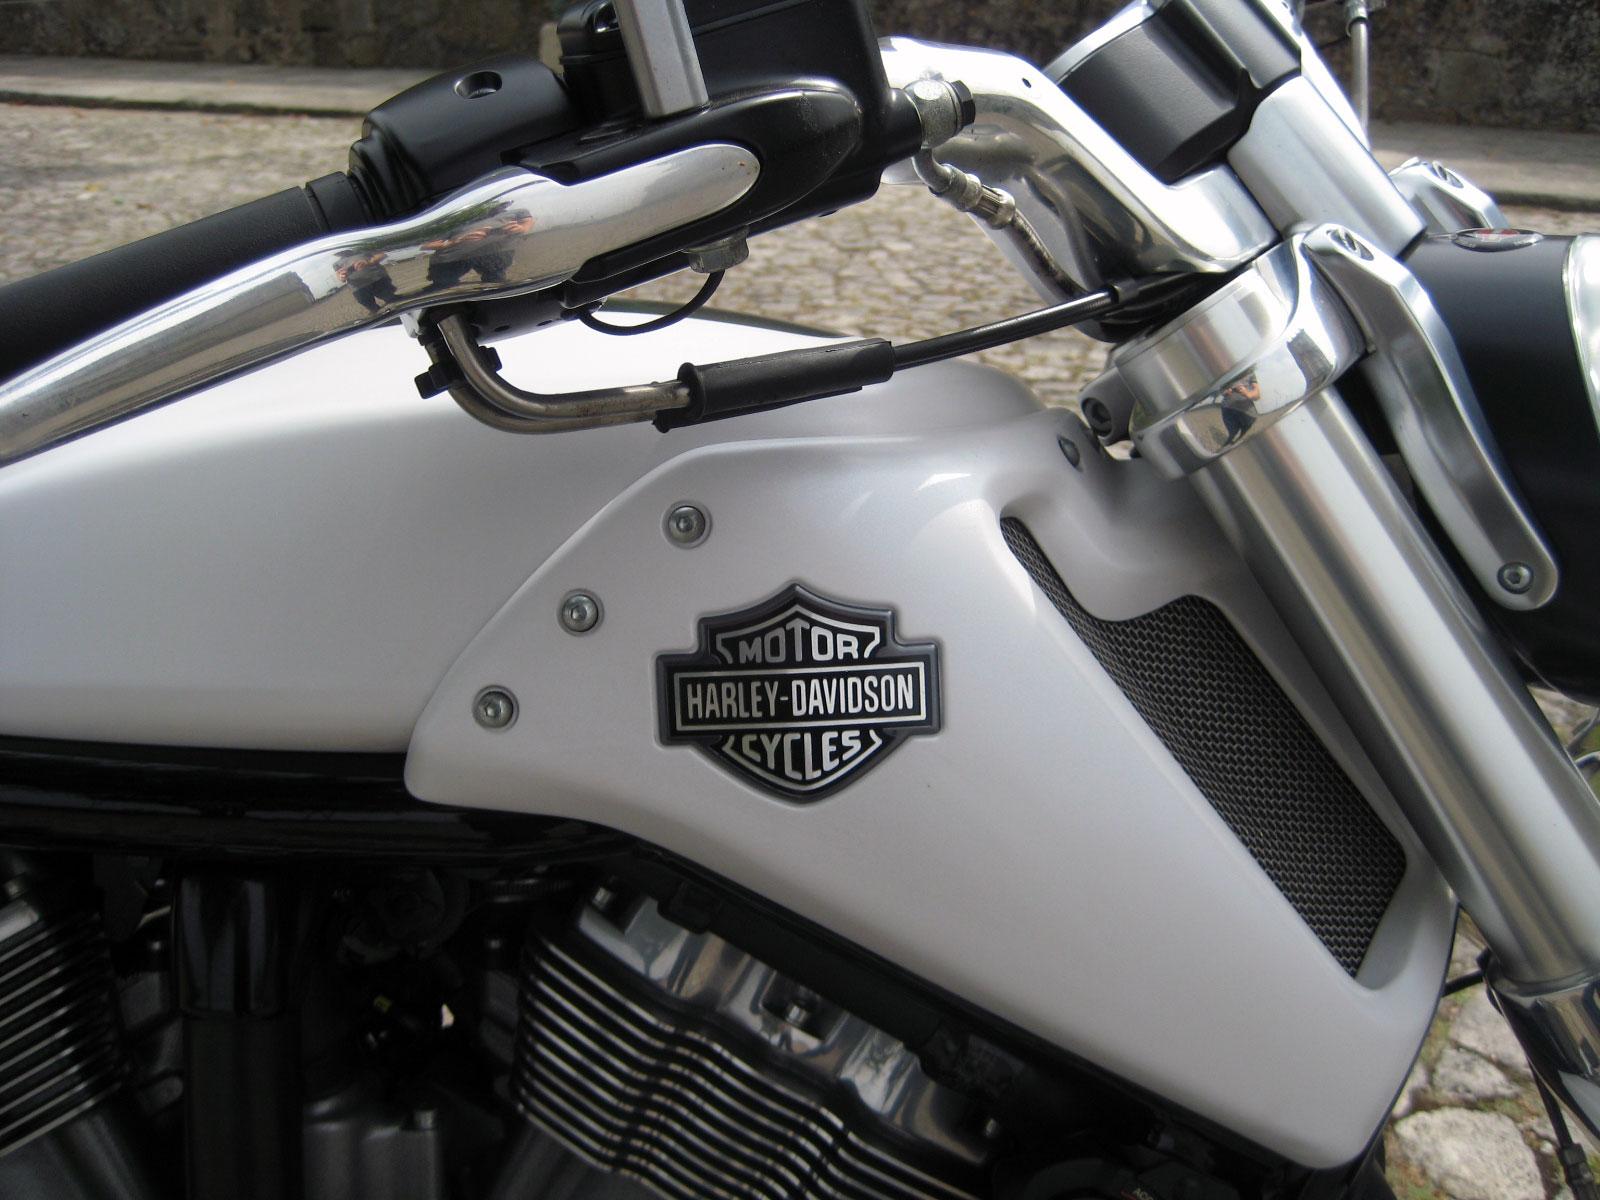 Limoeventos, Limousines, Aluguer de Limousines, Veículos, Harley Davidson